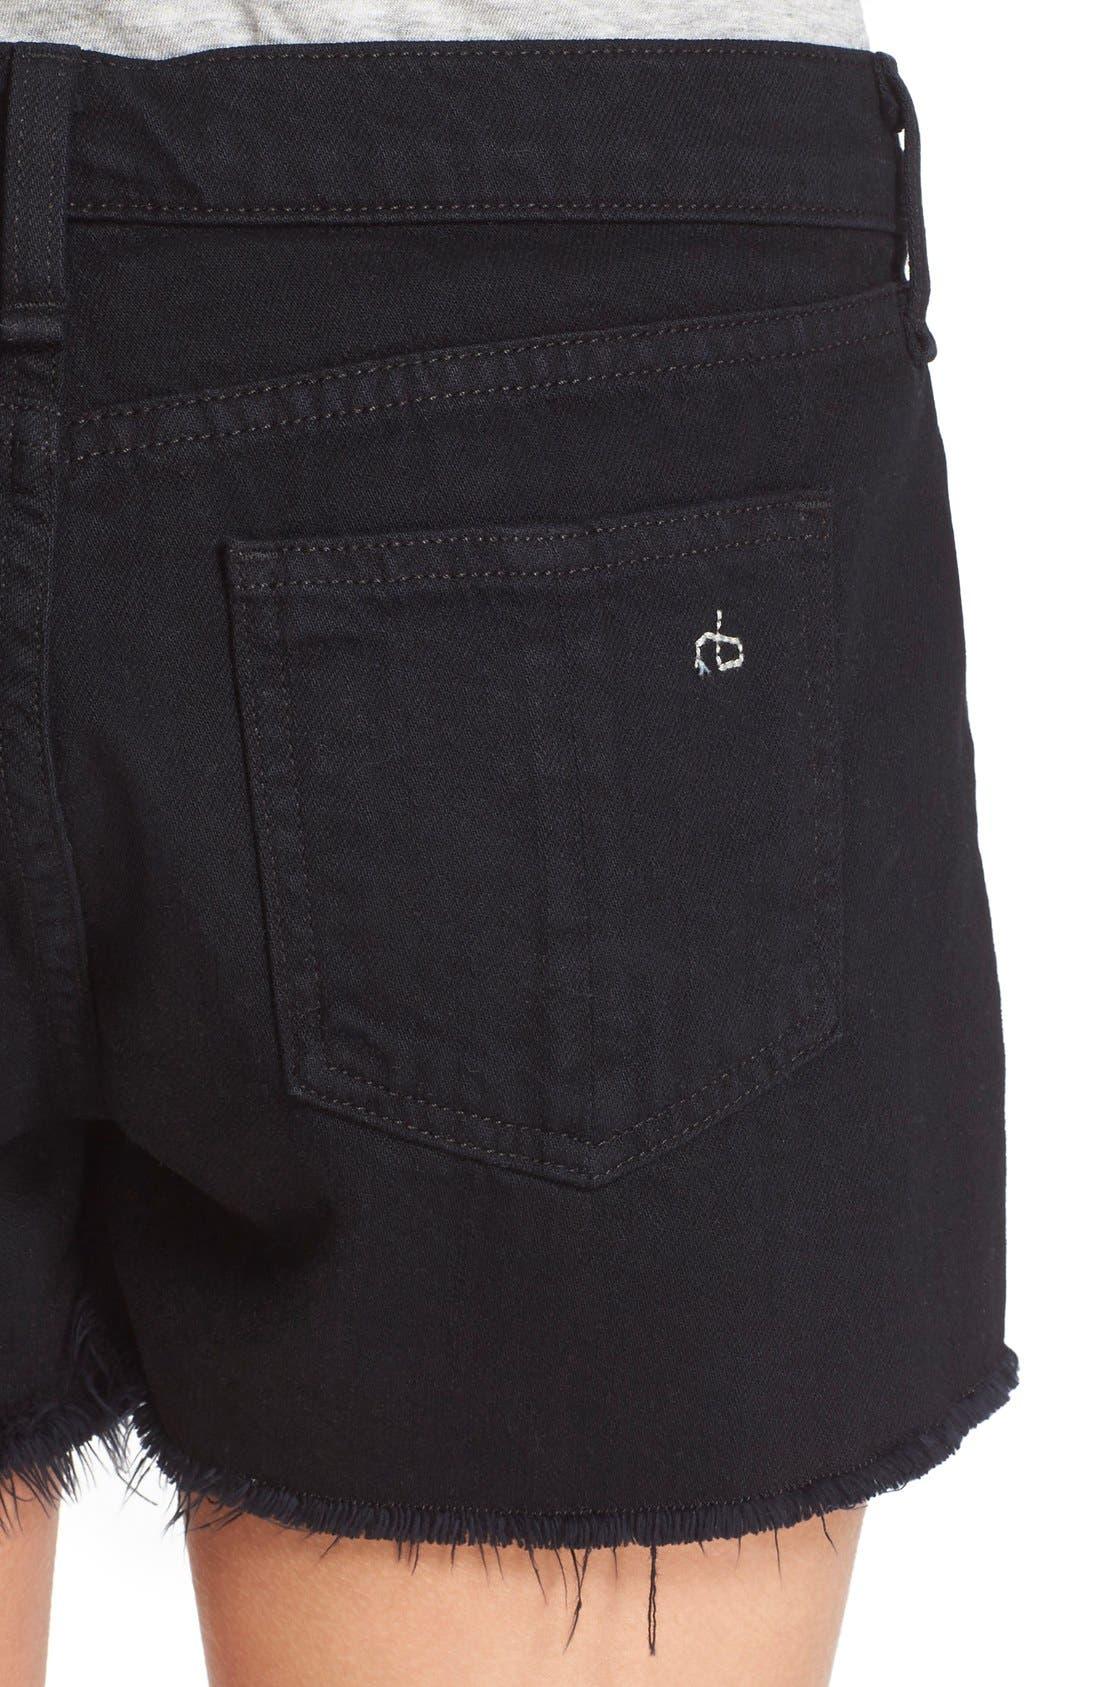 Cutoff Denim Shorts,                             Alternate thumbnail 5, color,                             001